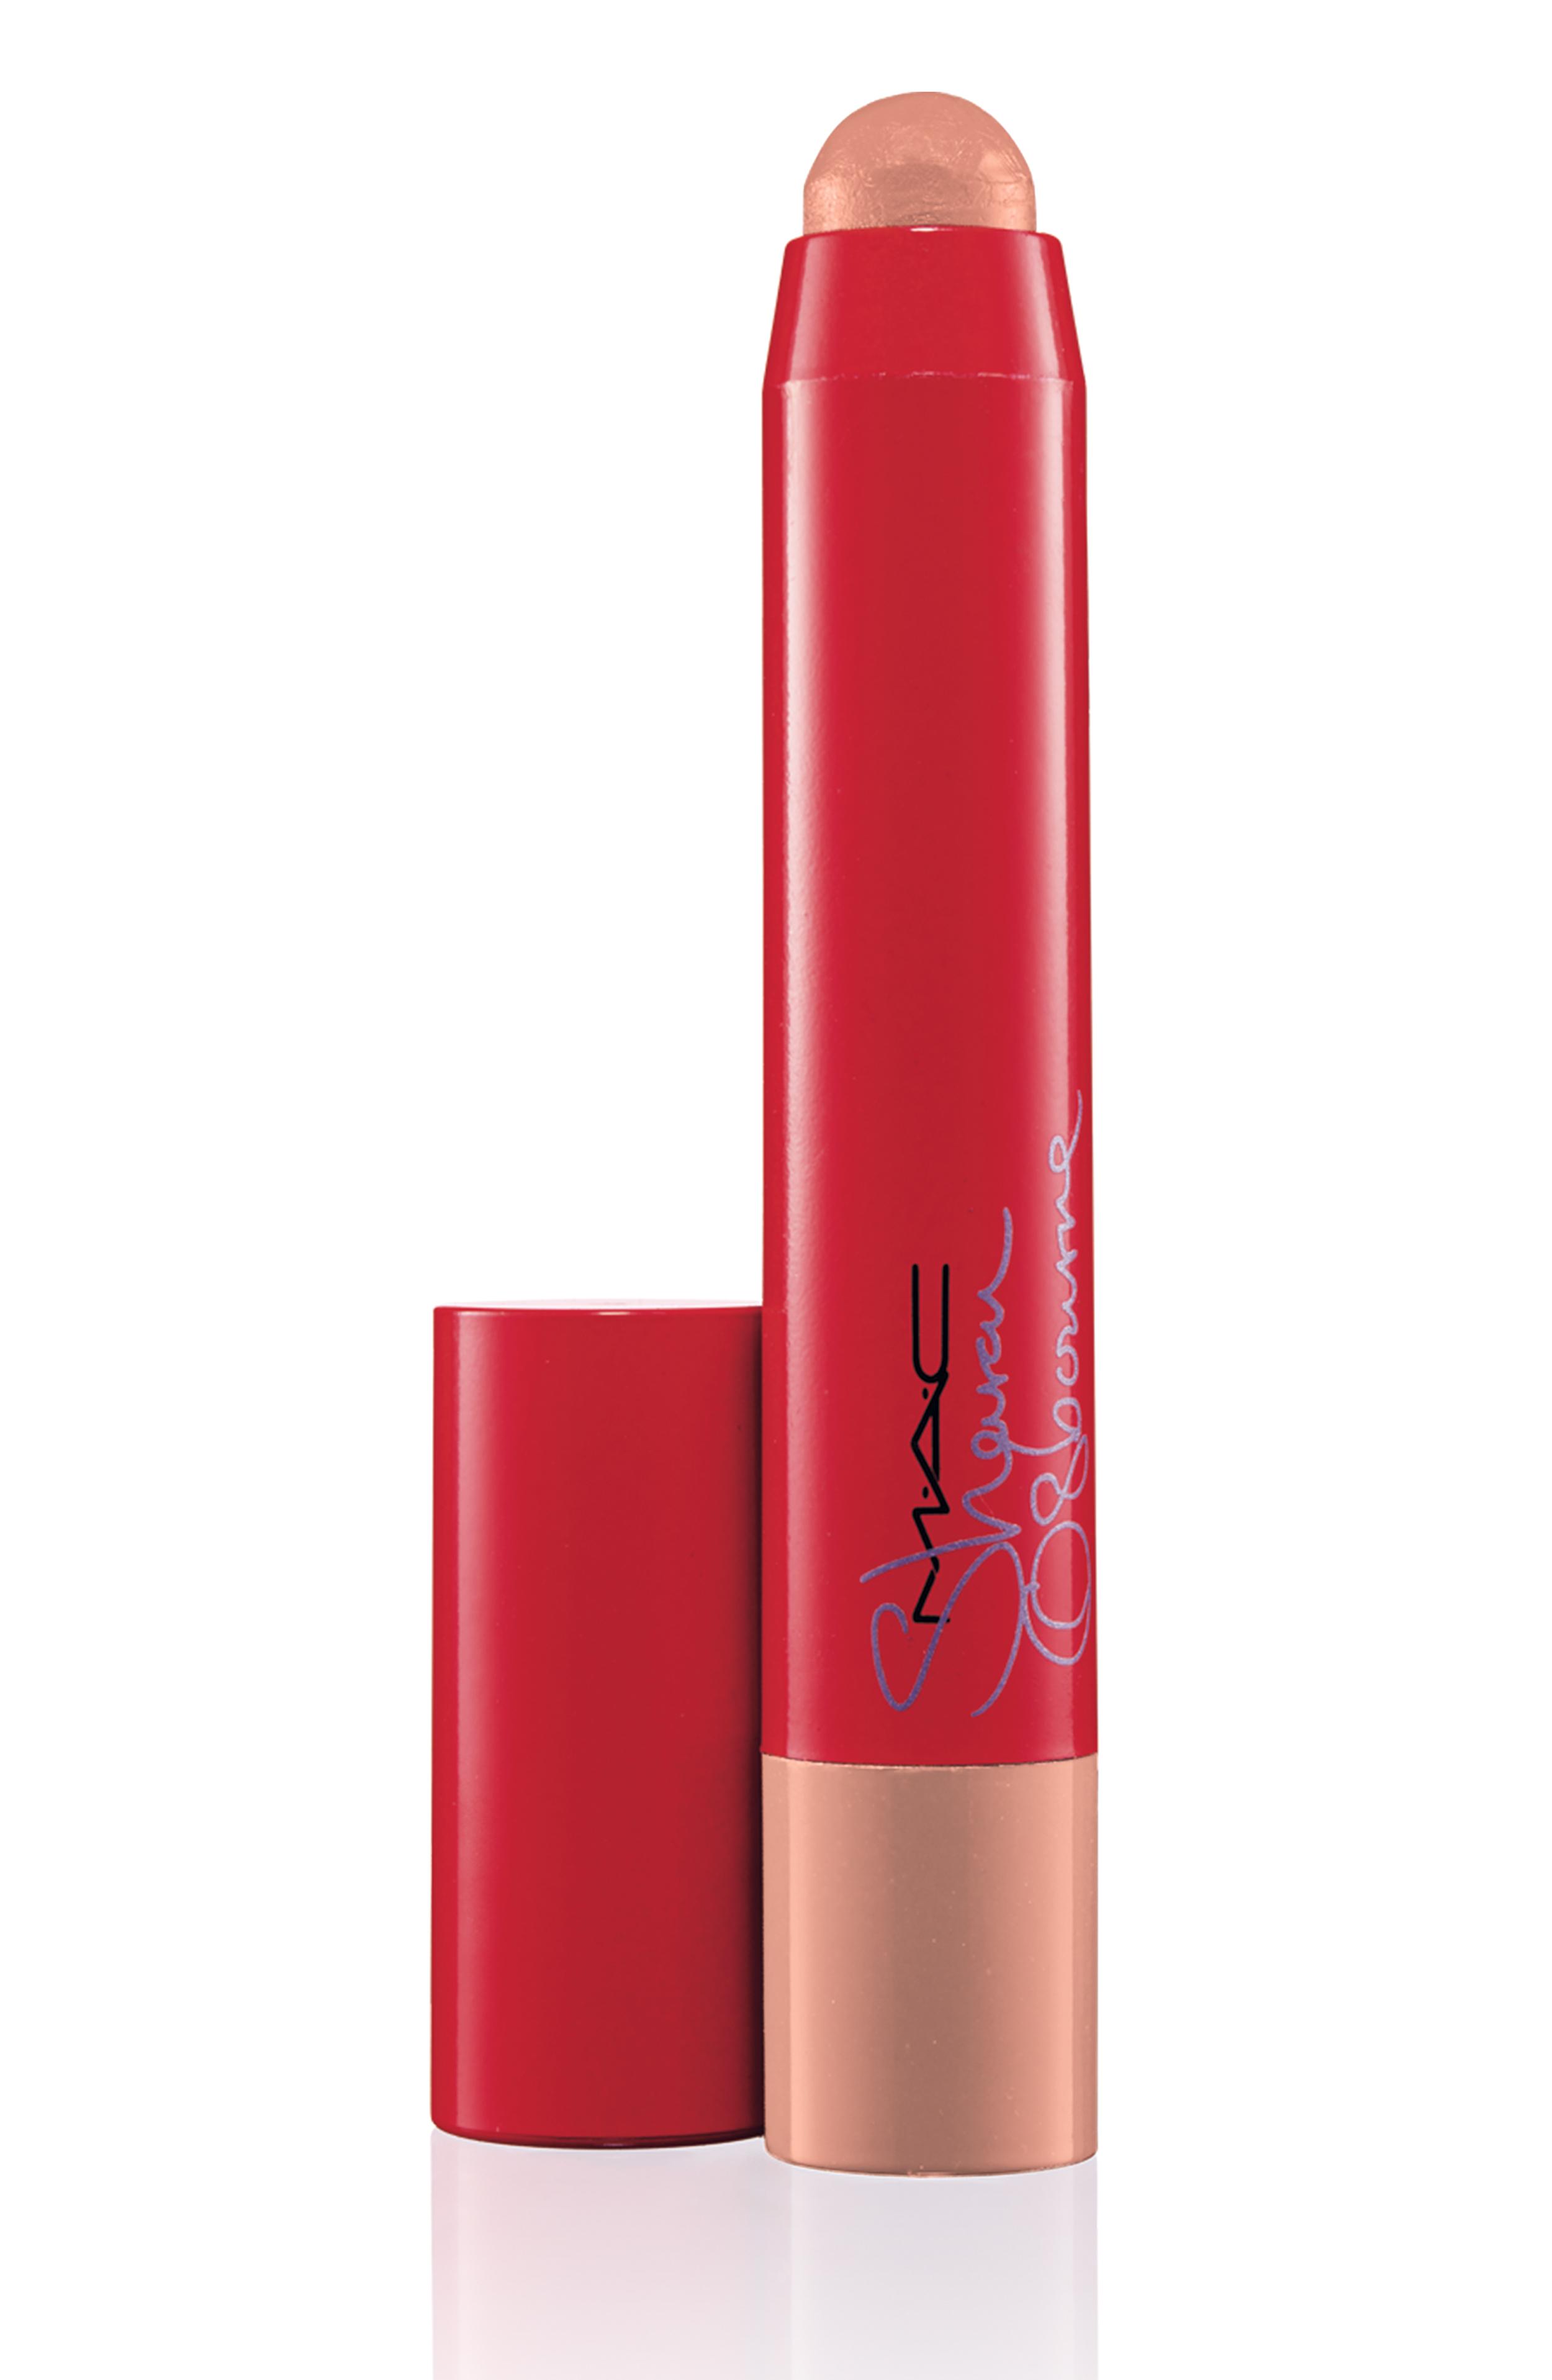 M.A.C. Sharon Osbourne PatentPolish lip pencil in Innocent